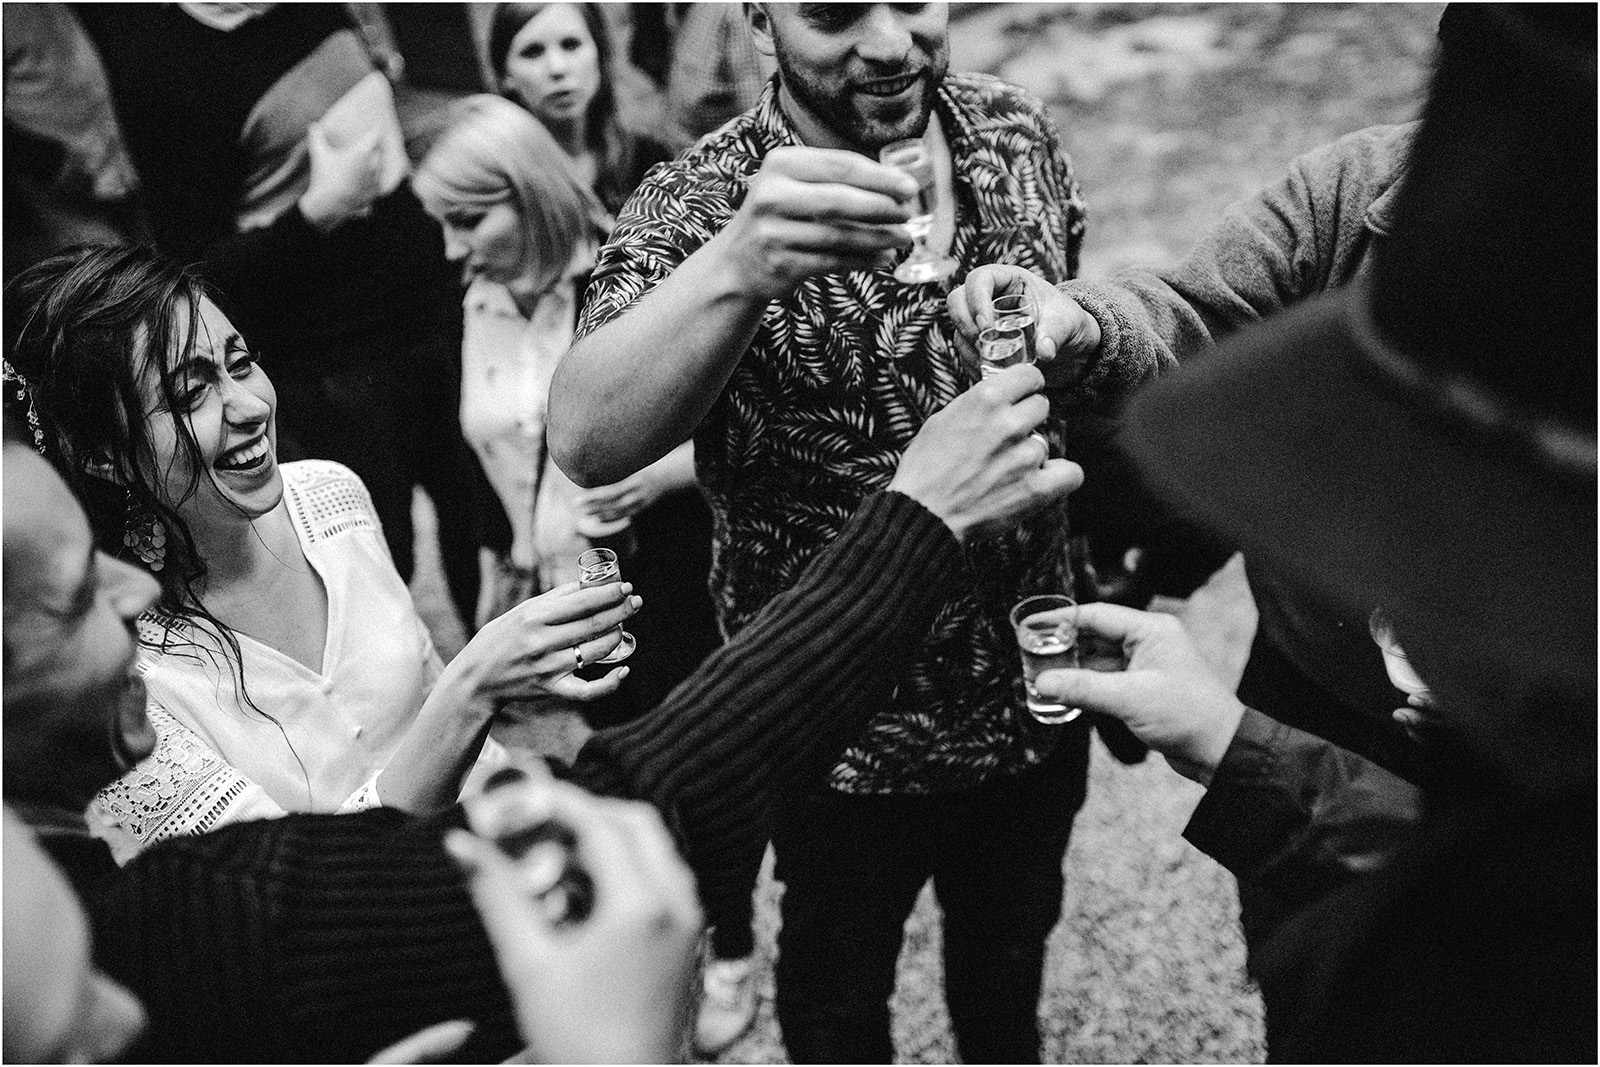 Agatka & Mati | garden party i impreza w stodole 37